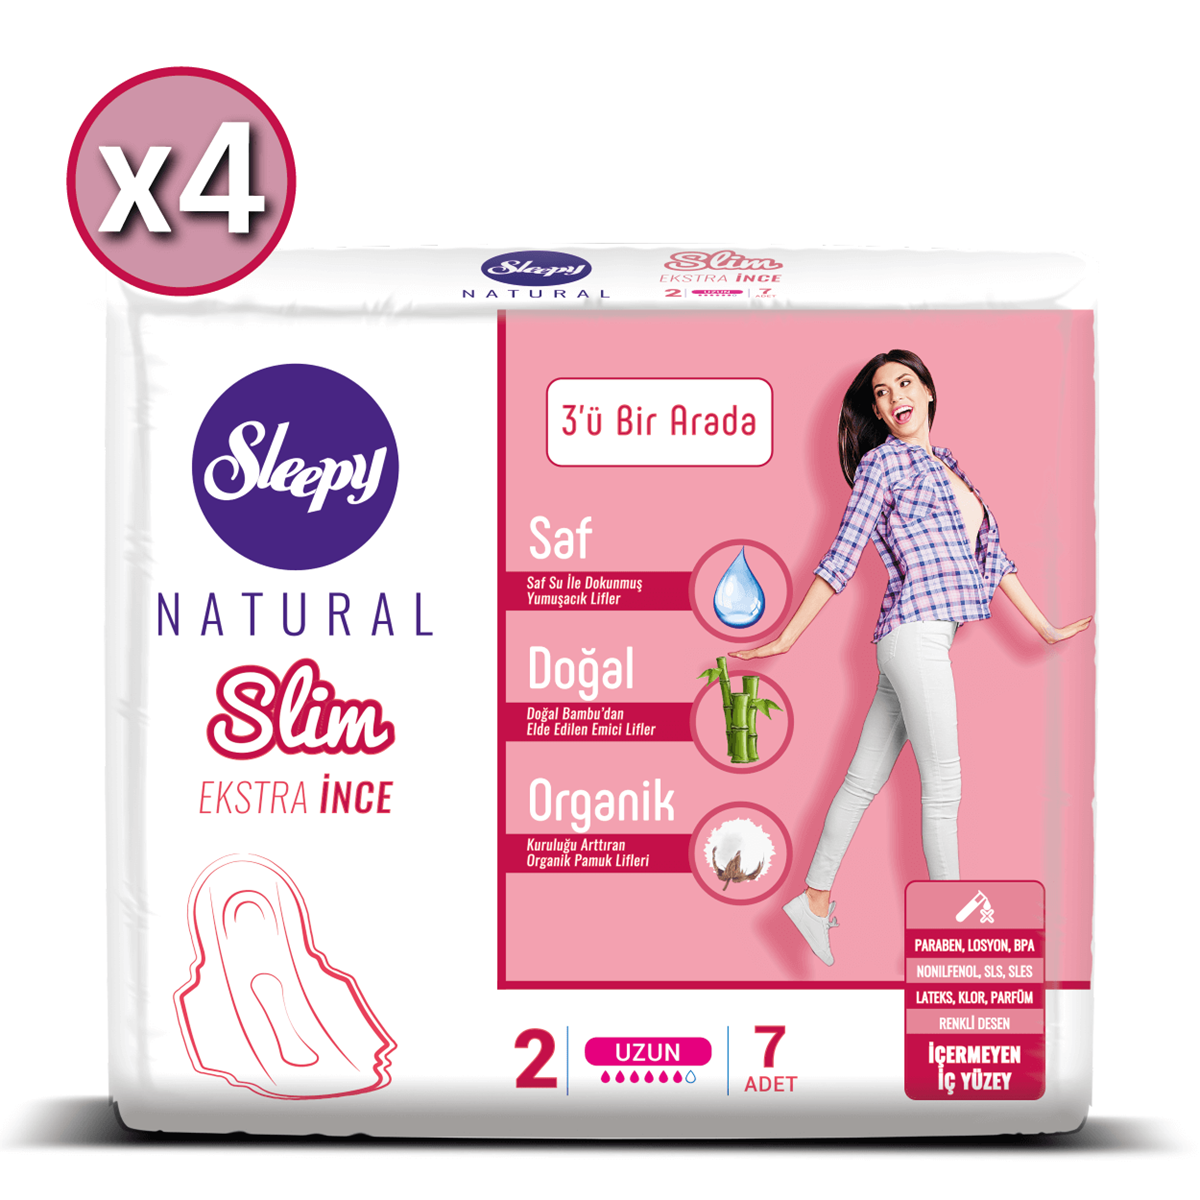 Sleepy Natural Slim Ekstra İnce Uzun (4X7 Ped)